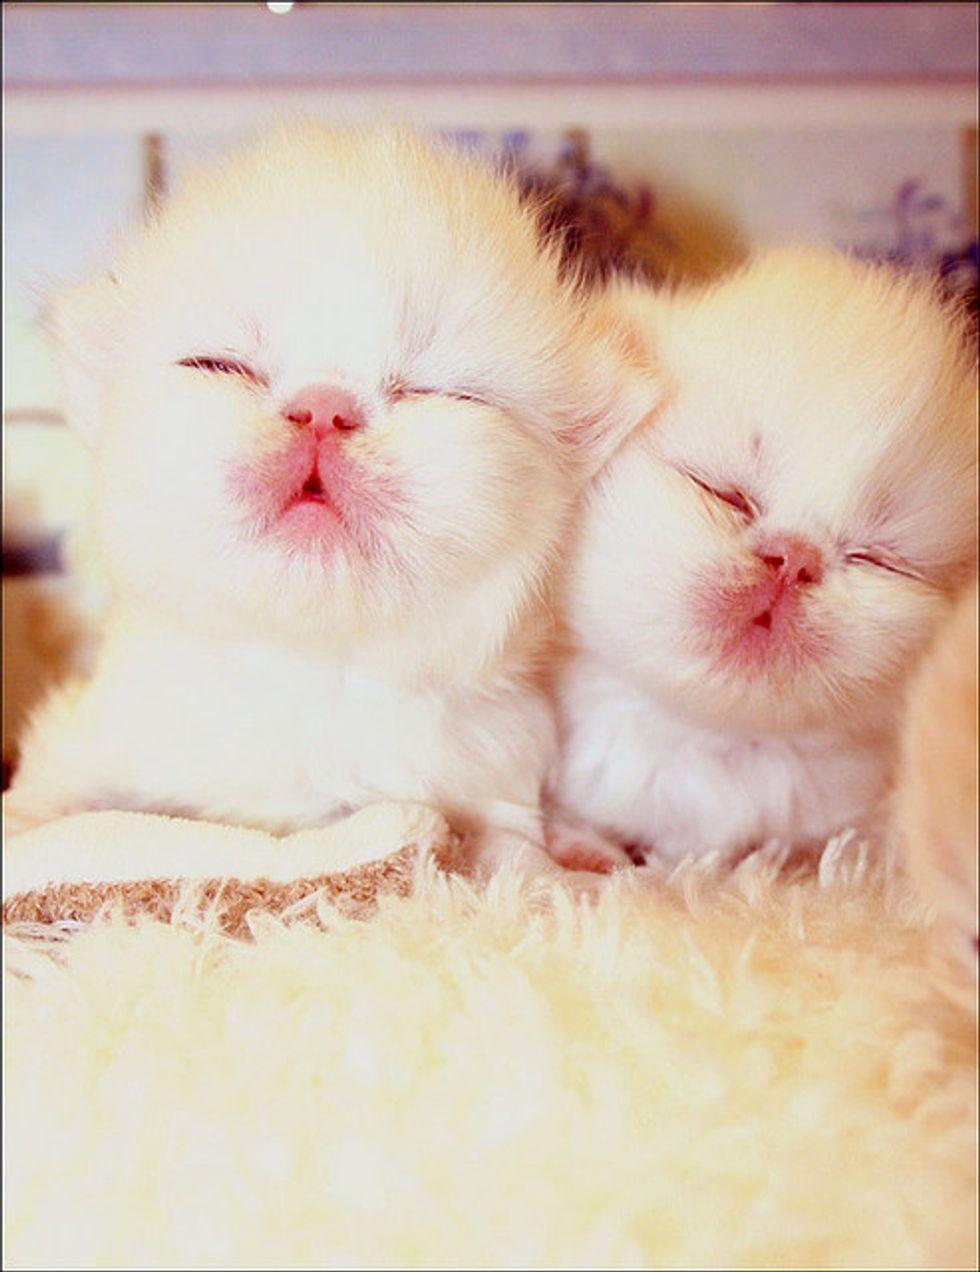 Sleepy and Cuddly Caturday